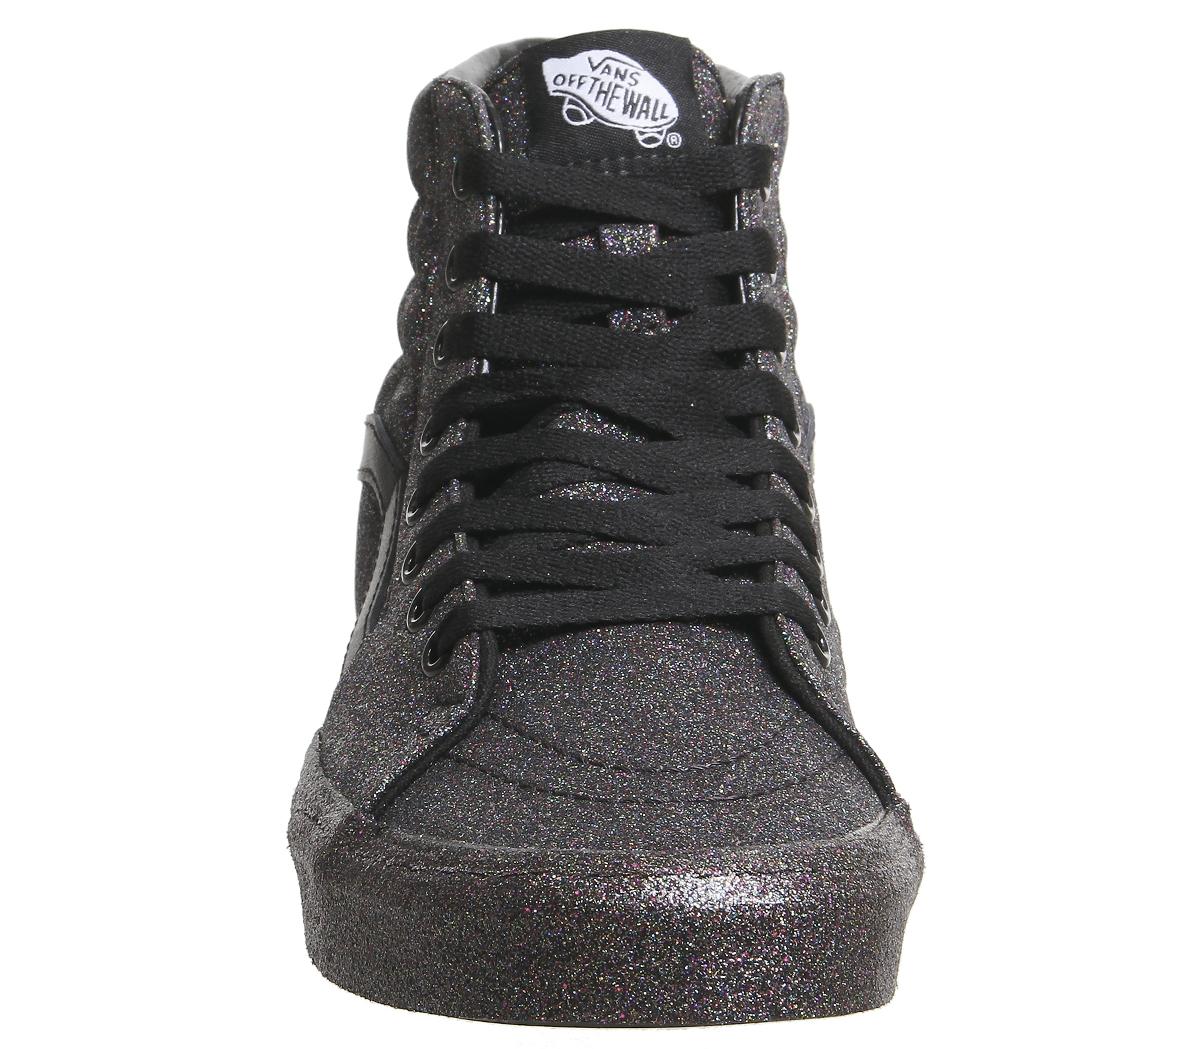 9c2b09eb7cd0de Sentinel Womens Vans Sk8 Hi Trainers Black Black Rainbow Glitter Trainers  Shoes